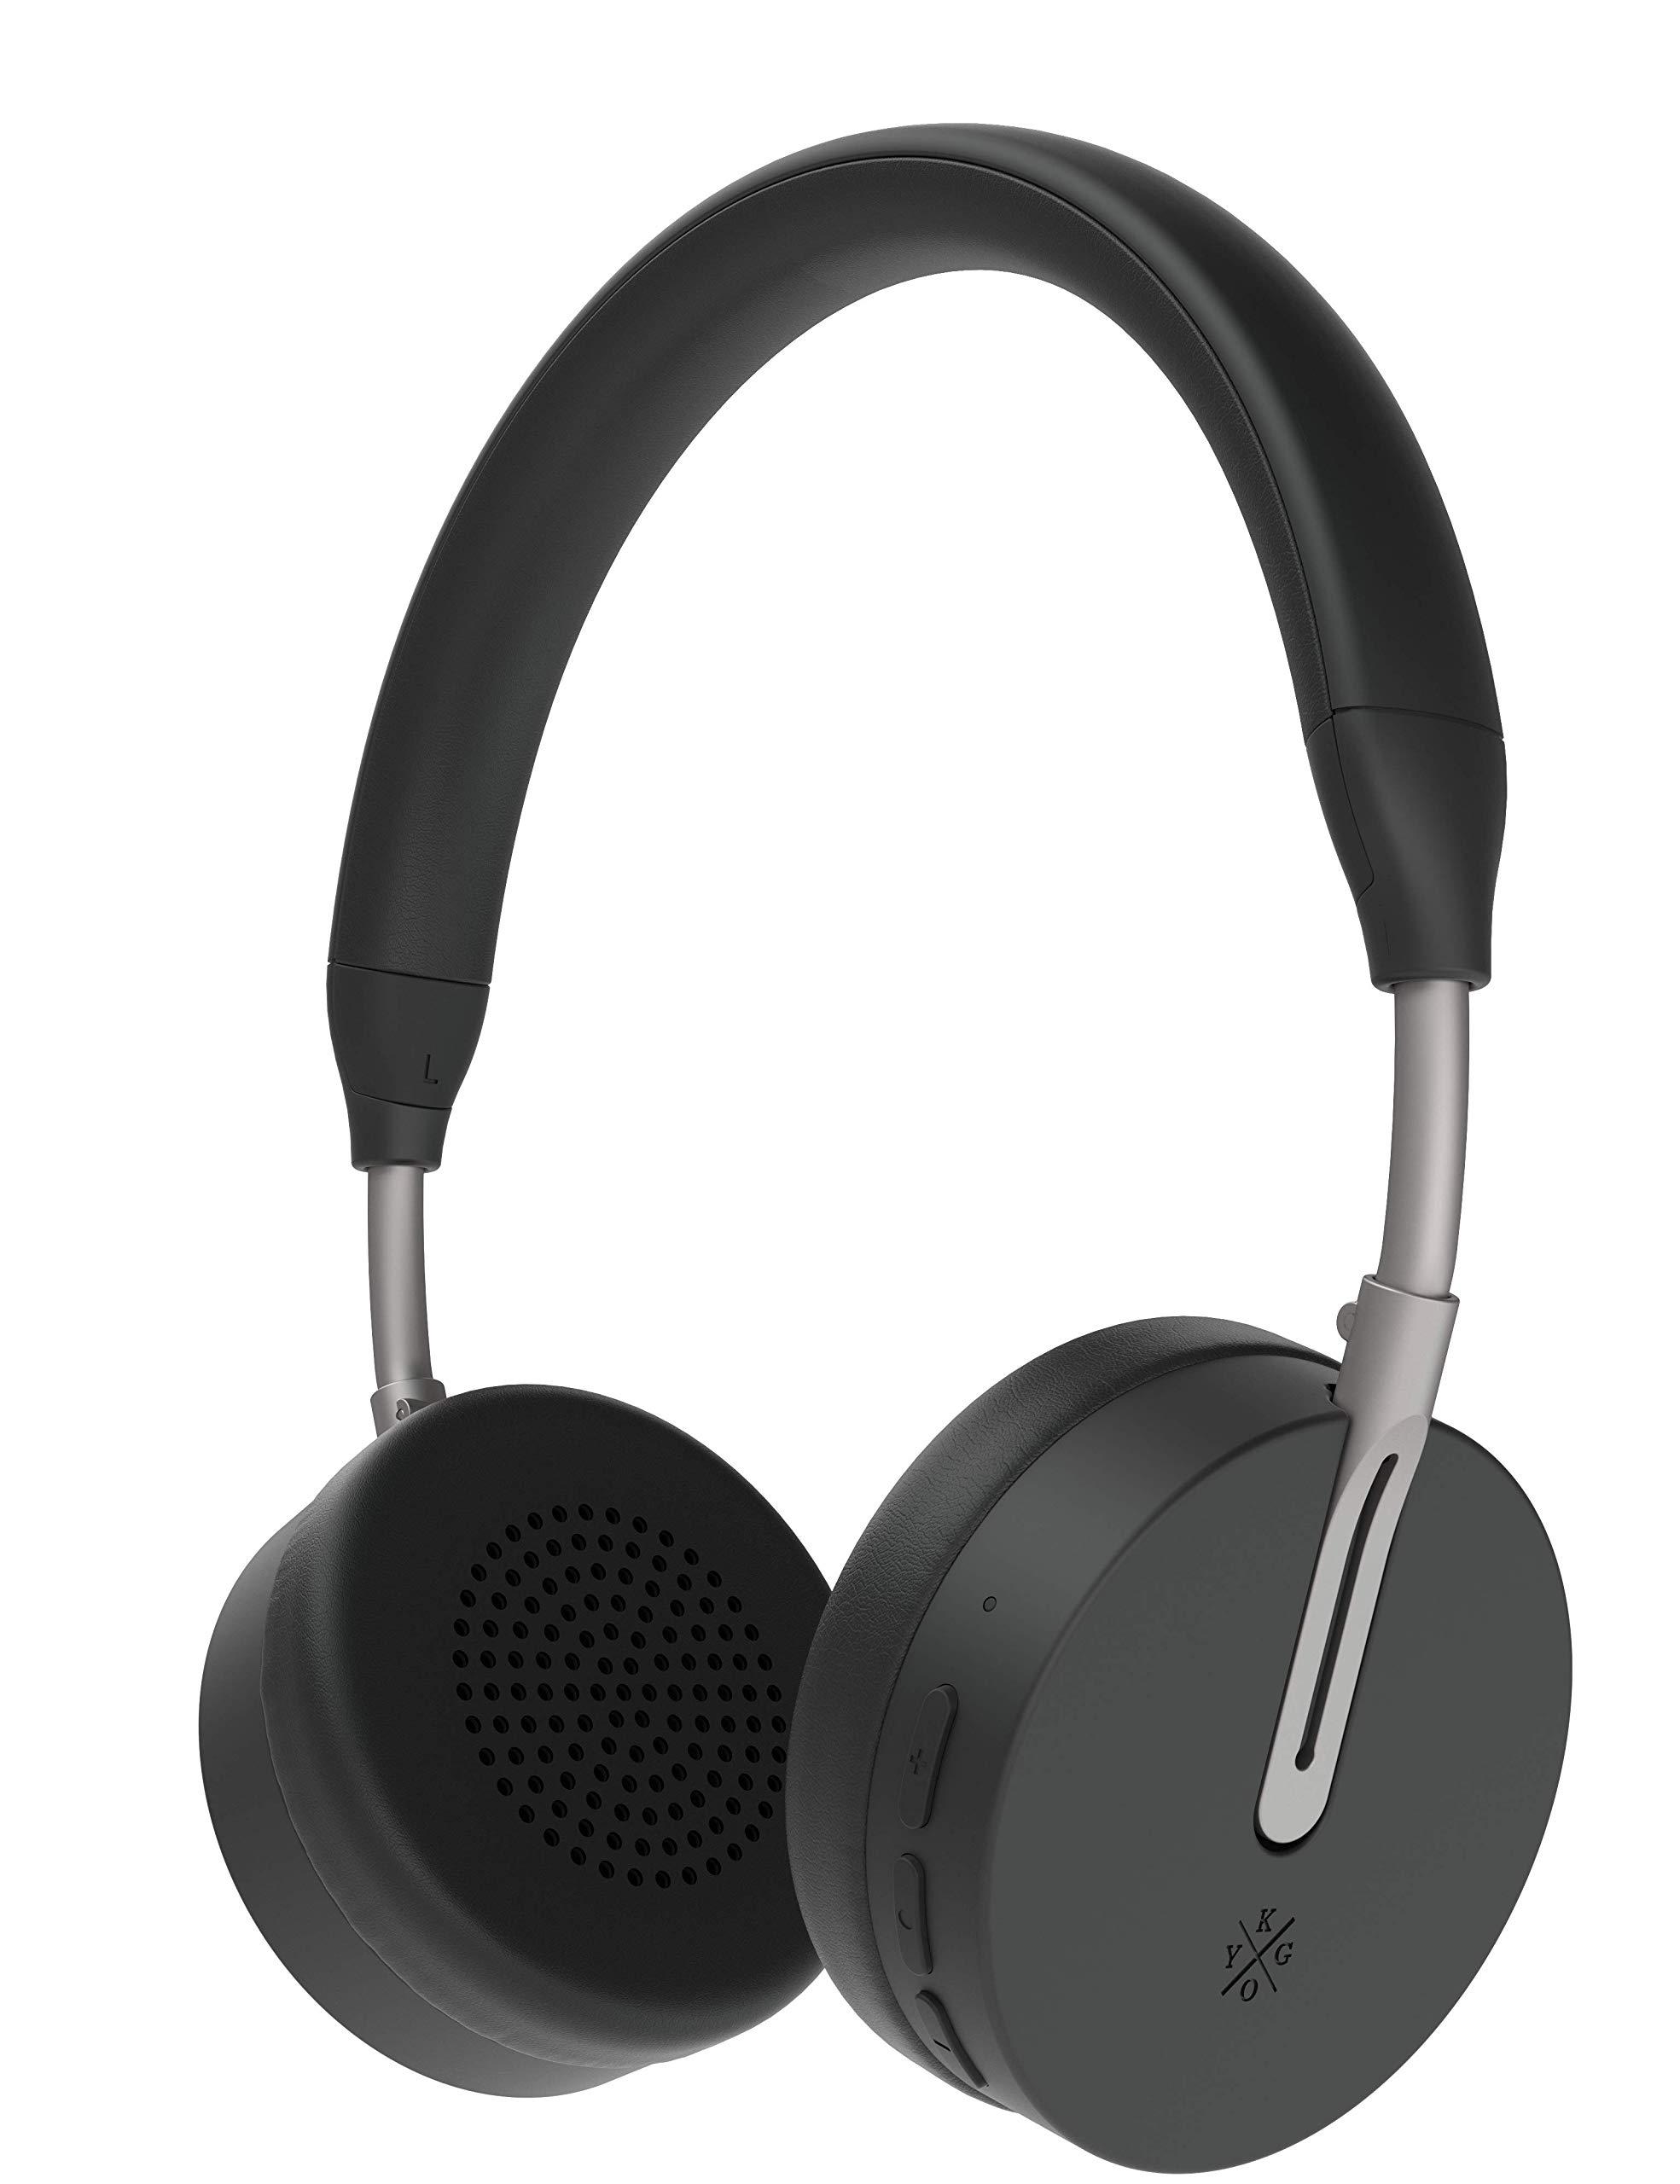 Amazon Com Kygo Life A6 500 On Ear Bluetooth Headphones Aptx And Aac Codecs Built In Microphone Nfc Pairing Memory Foam Ear Cushions 18 Hours Playback Kygo Sound App Pro Line Black Electronics